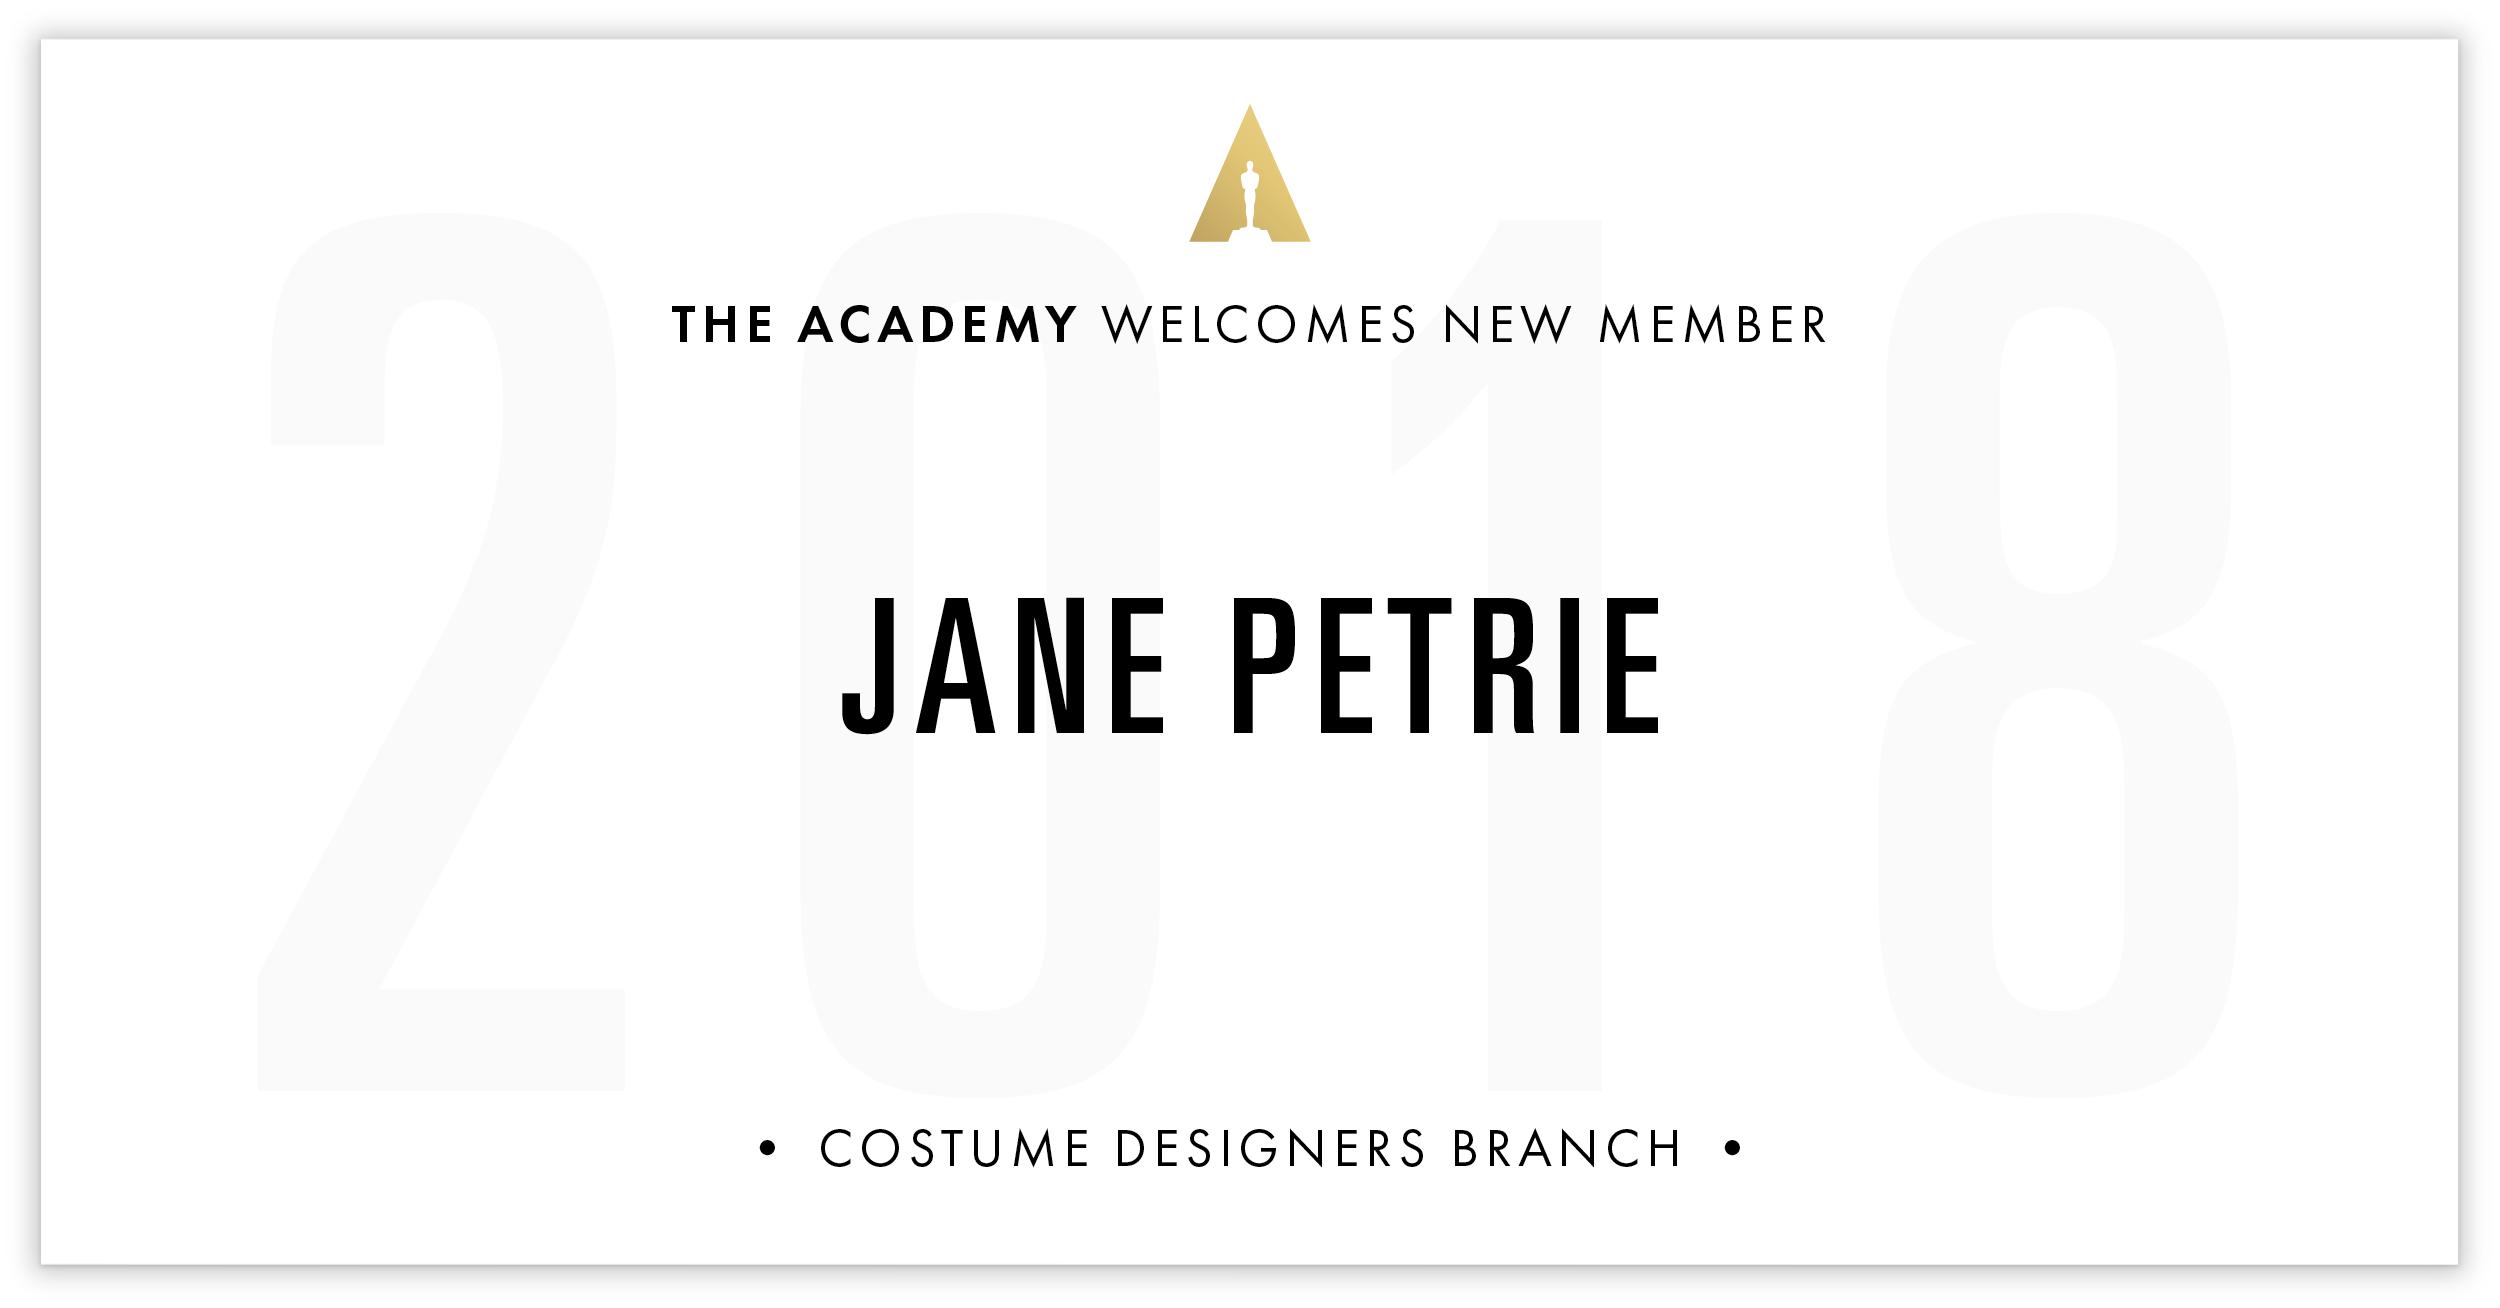 Jane Petrie is invited!